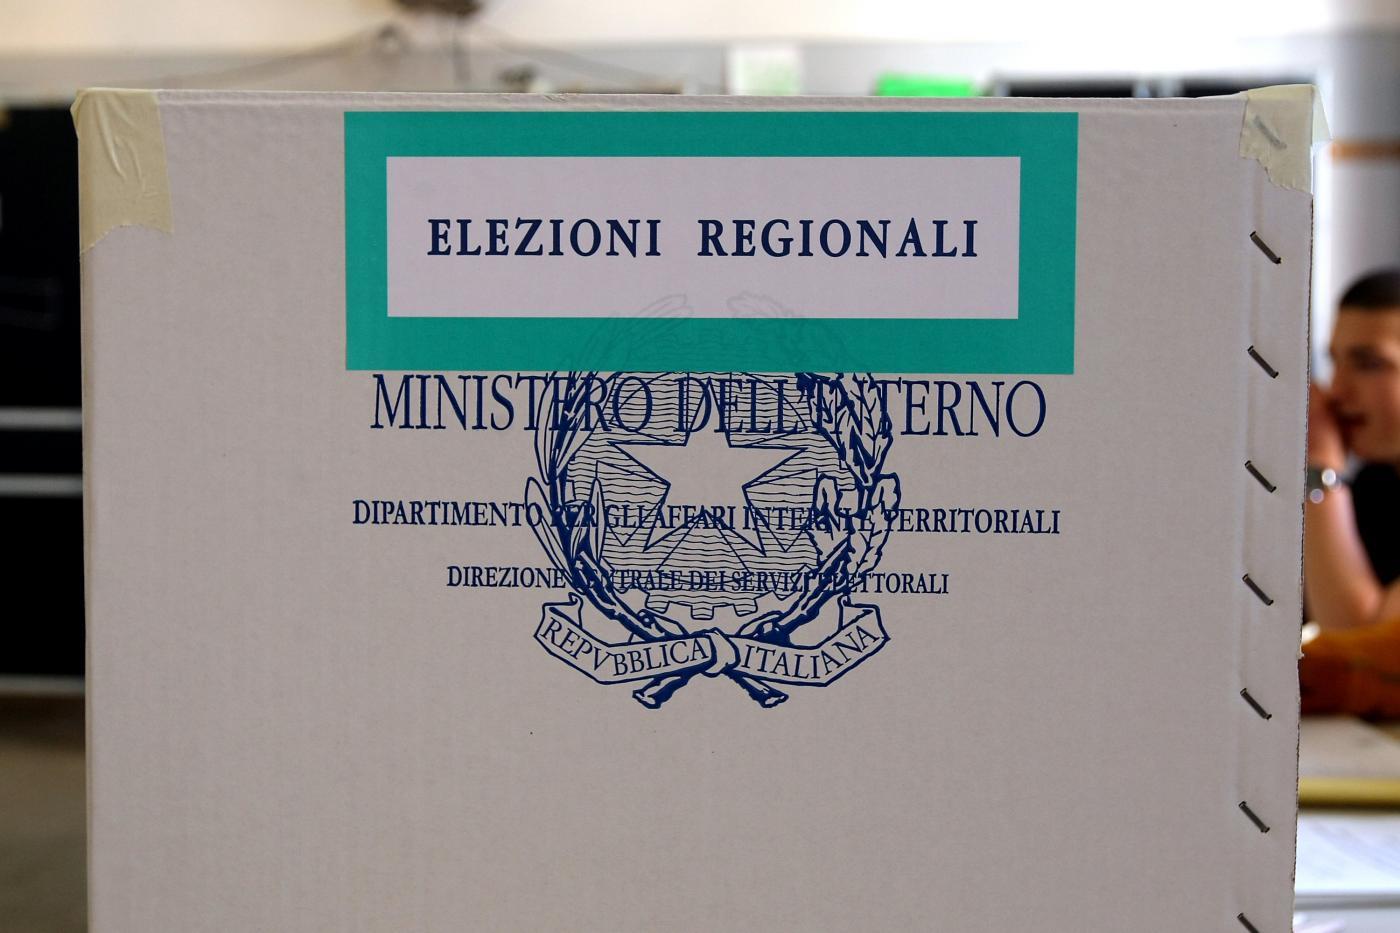 elezioni regionali emilia romagna 03